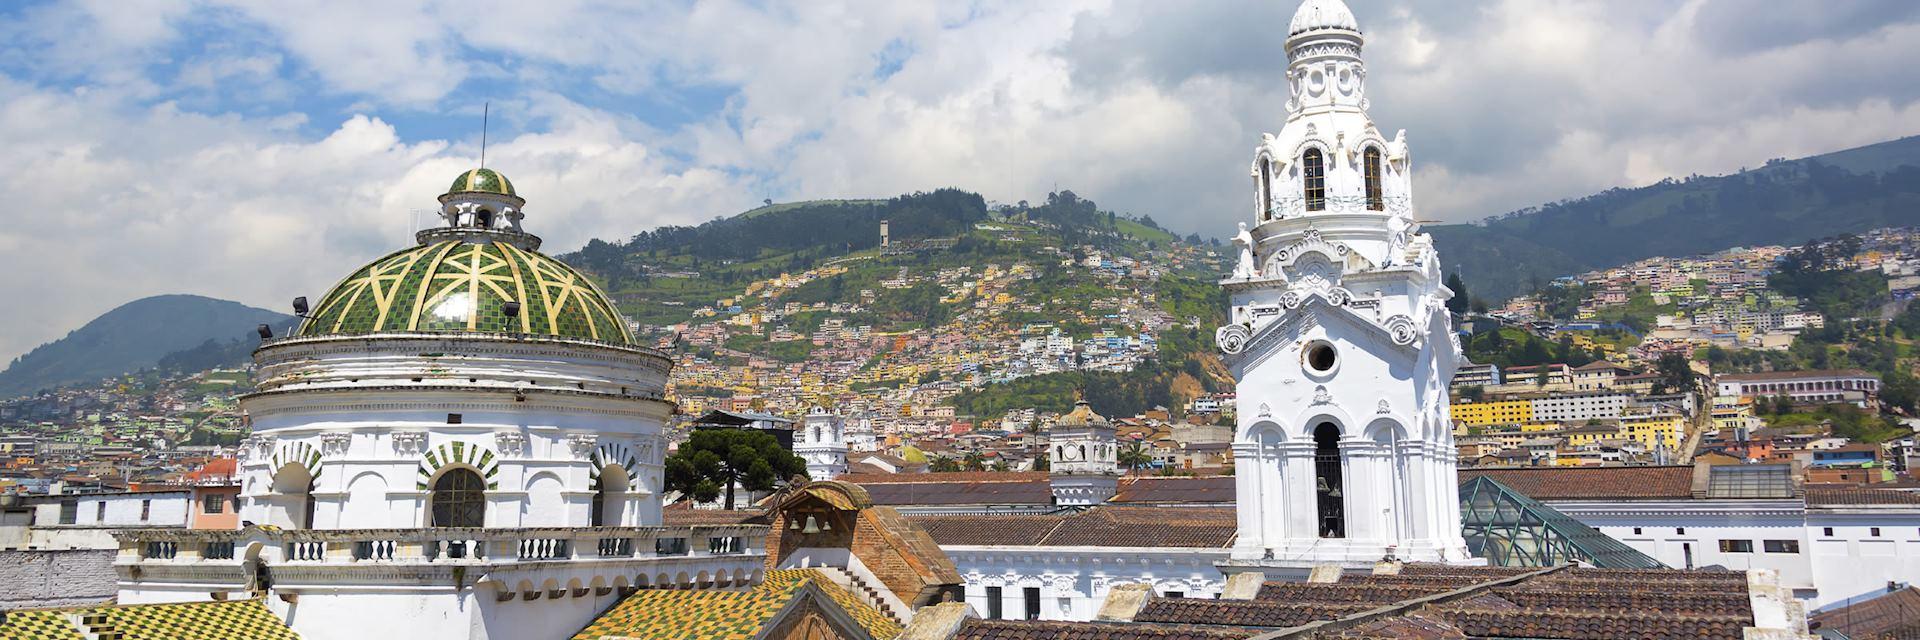 Quito, a UNESCO World Heritage Site